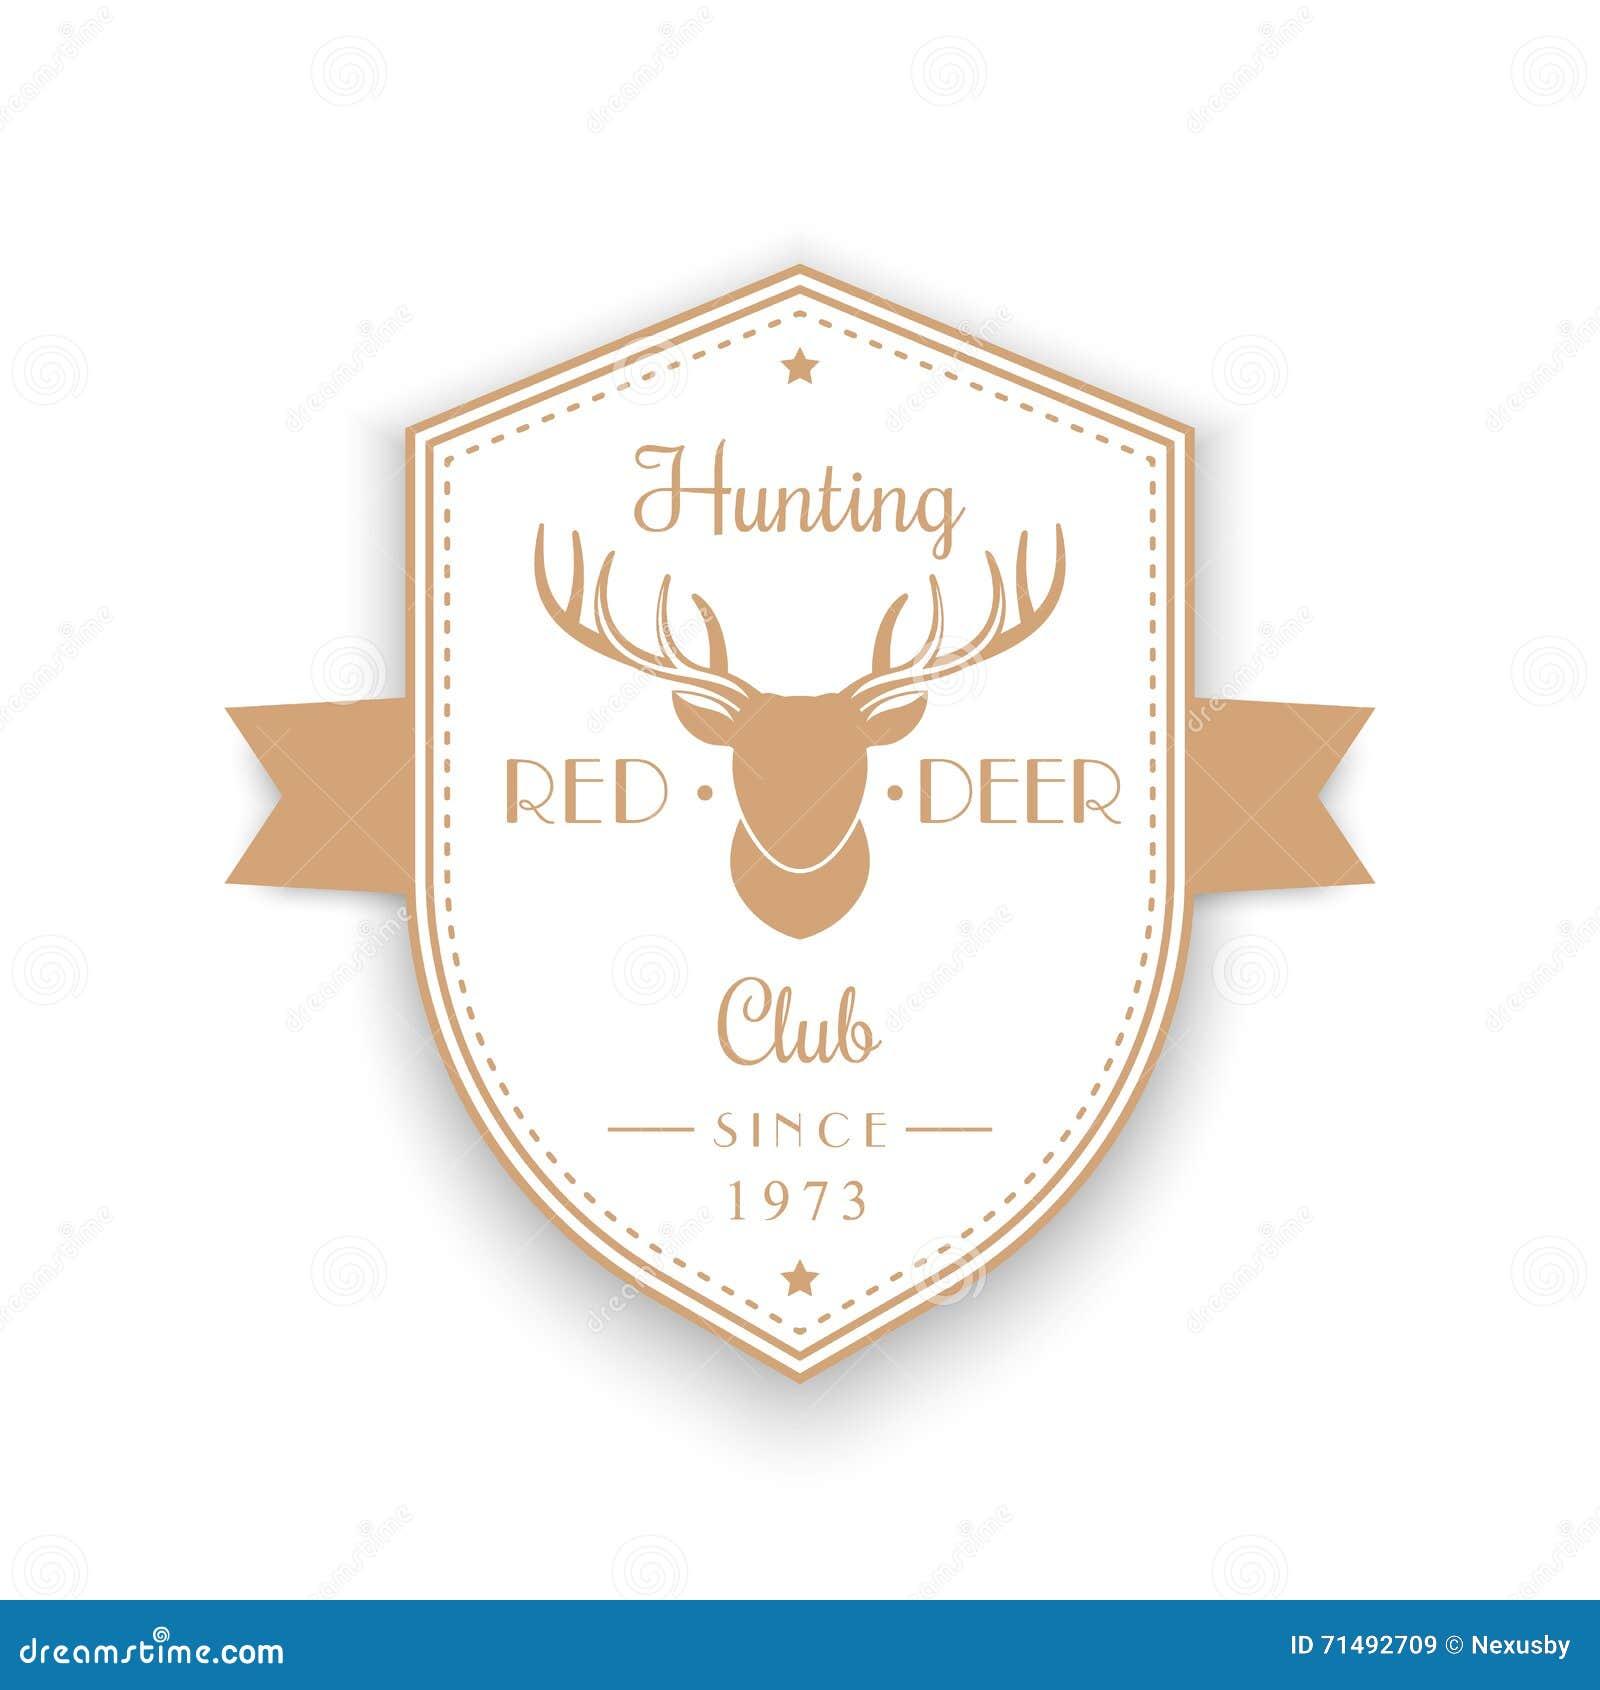 Hunting Club Vintage Emblem Badge Logo With Deer Head Shield Shape On